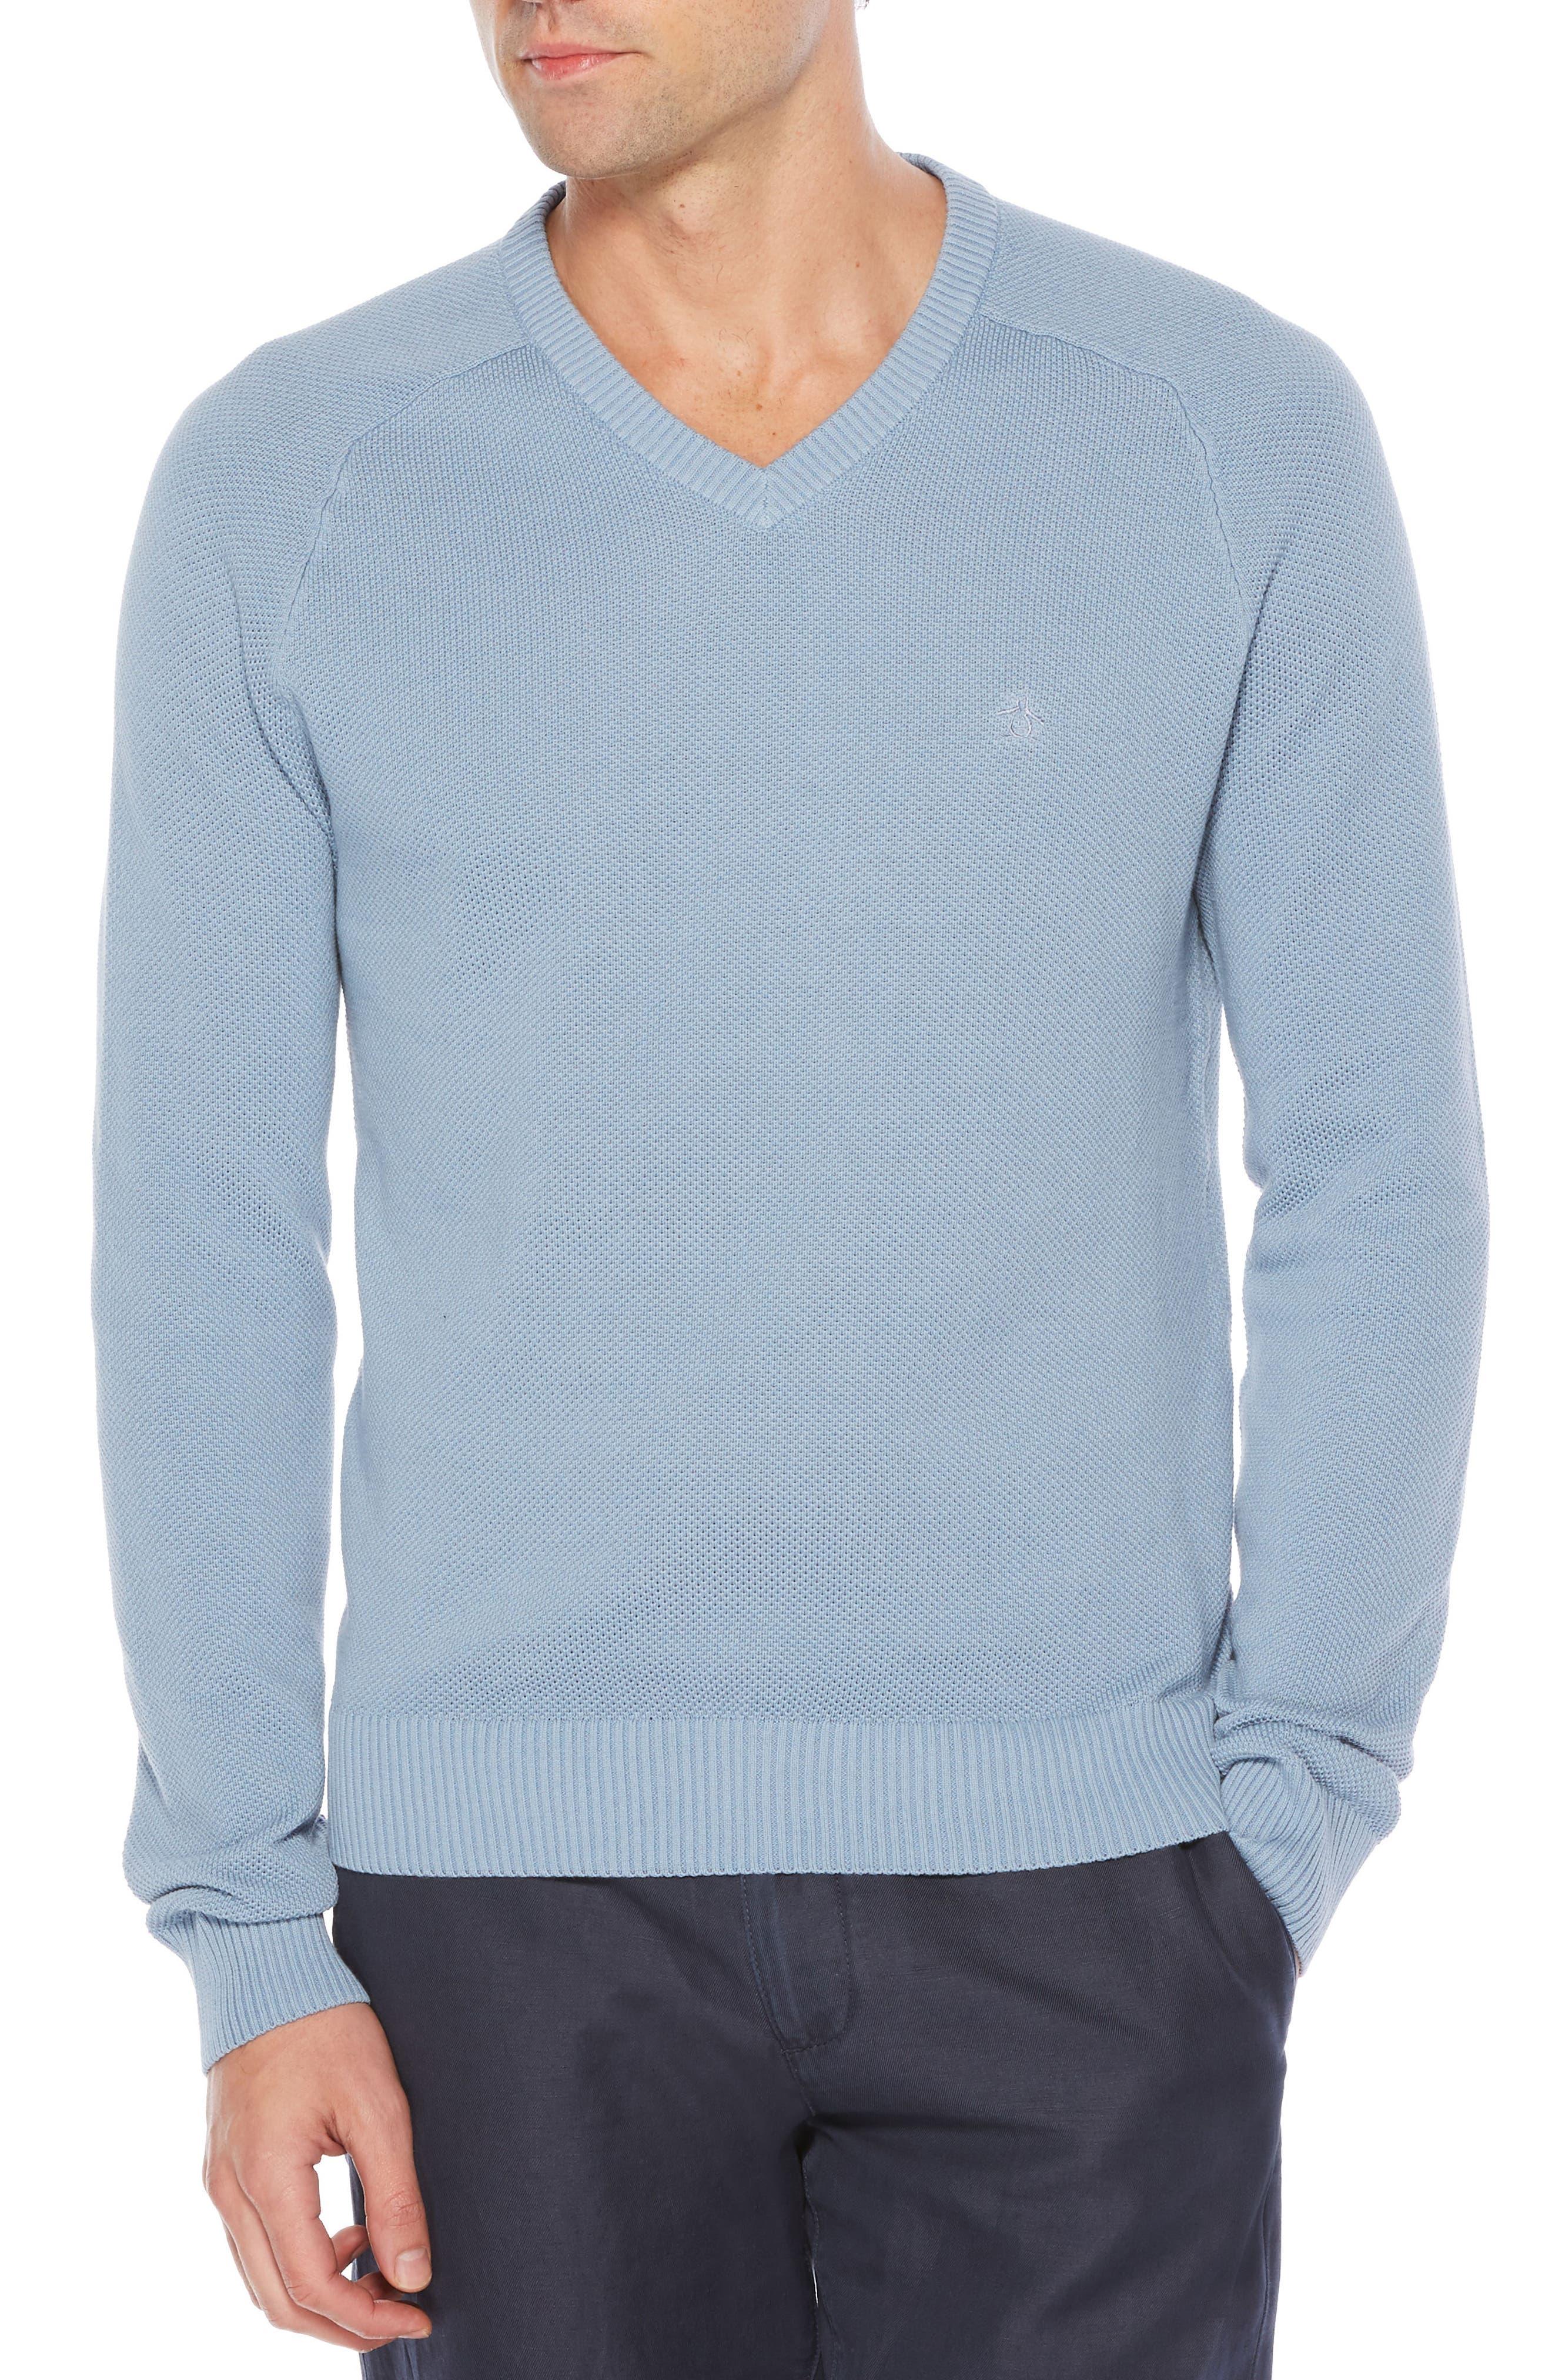 Main Image - Original Penguin Piqué V-Neck Sweater (Big & Tall)